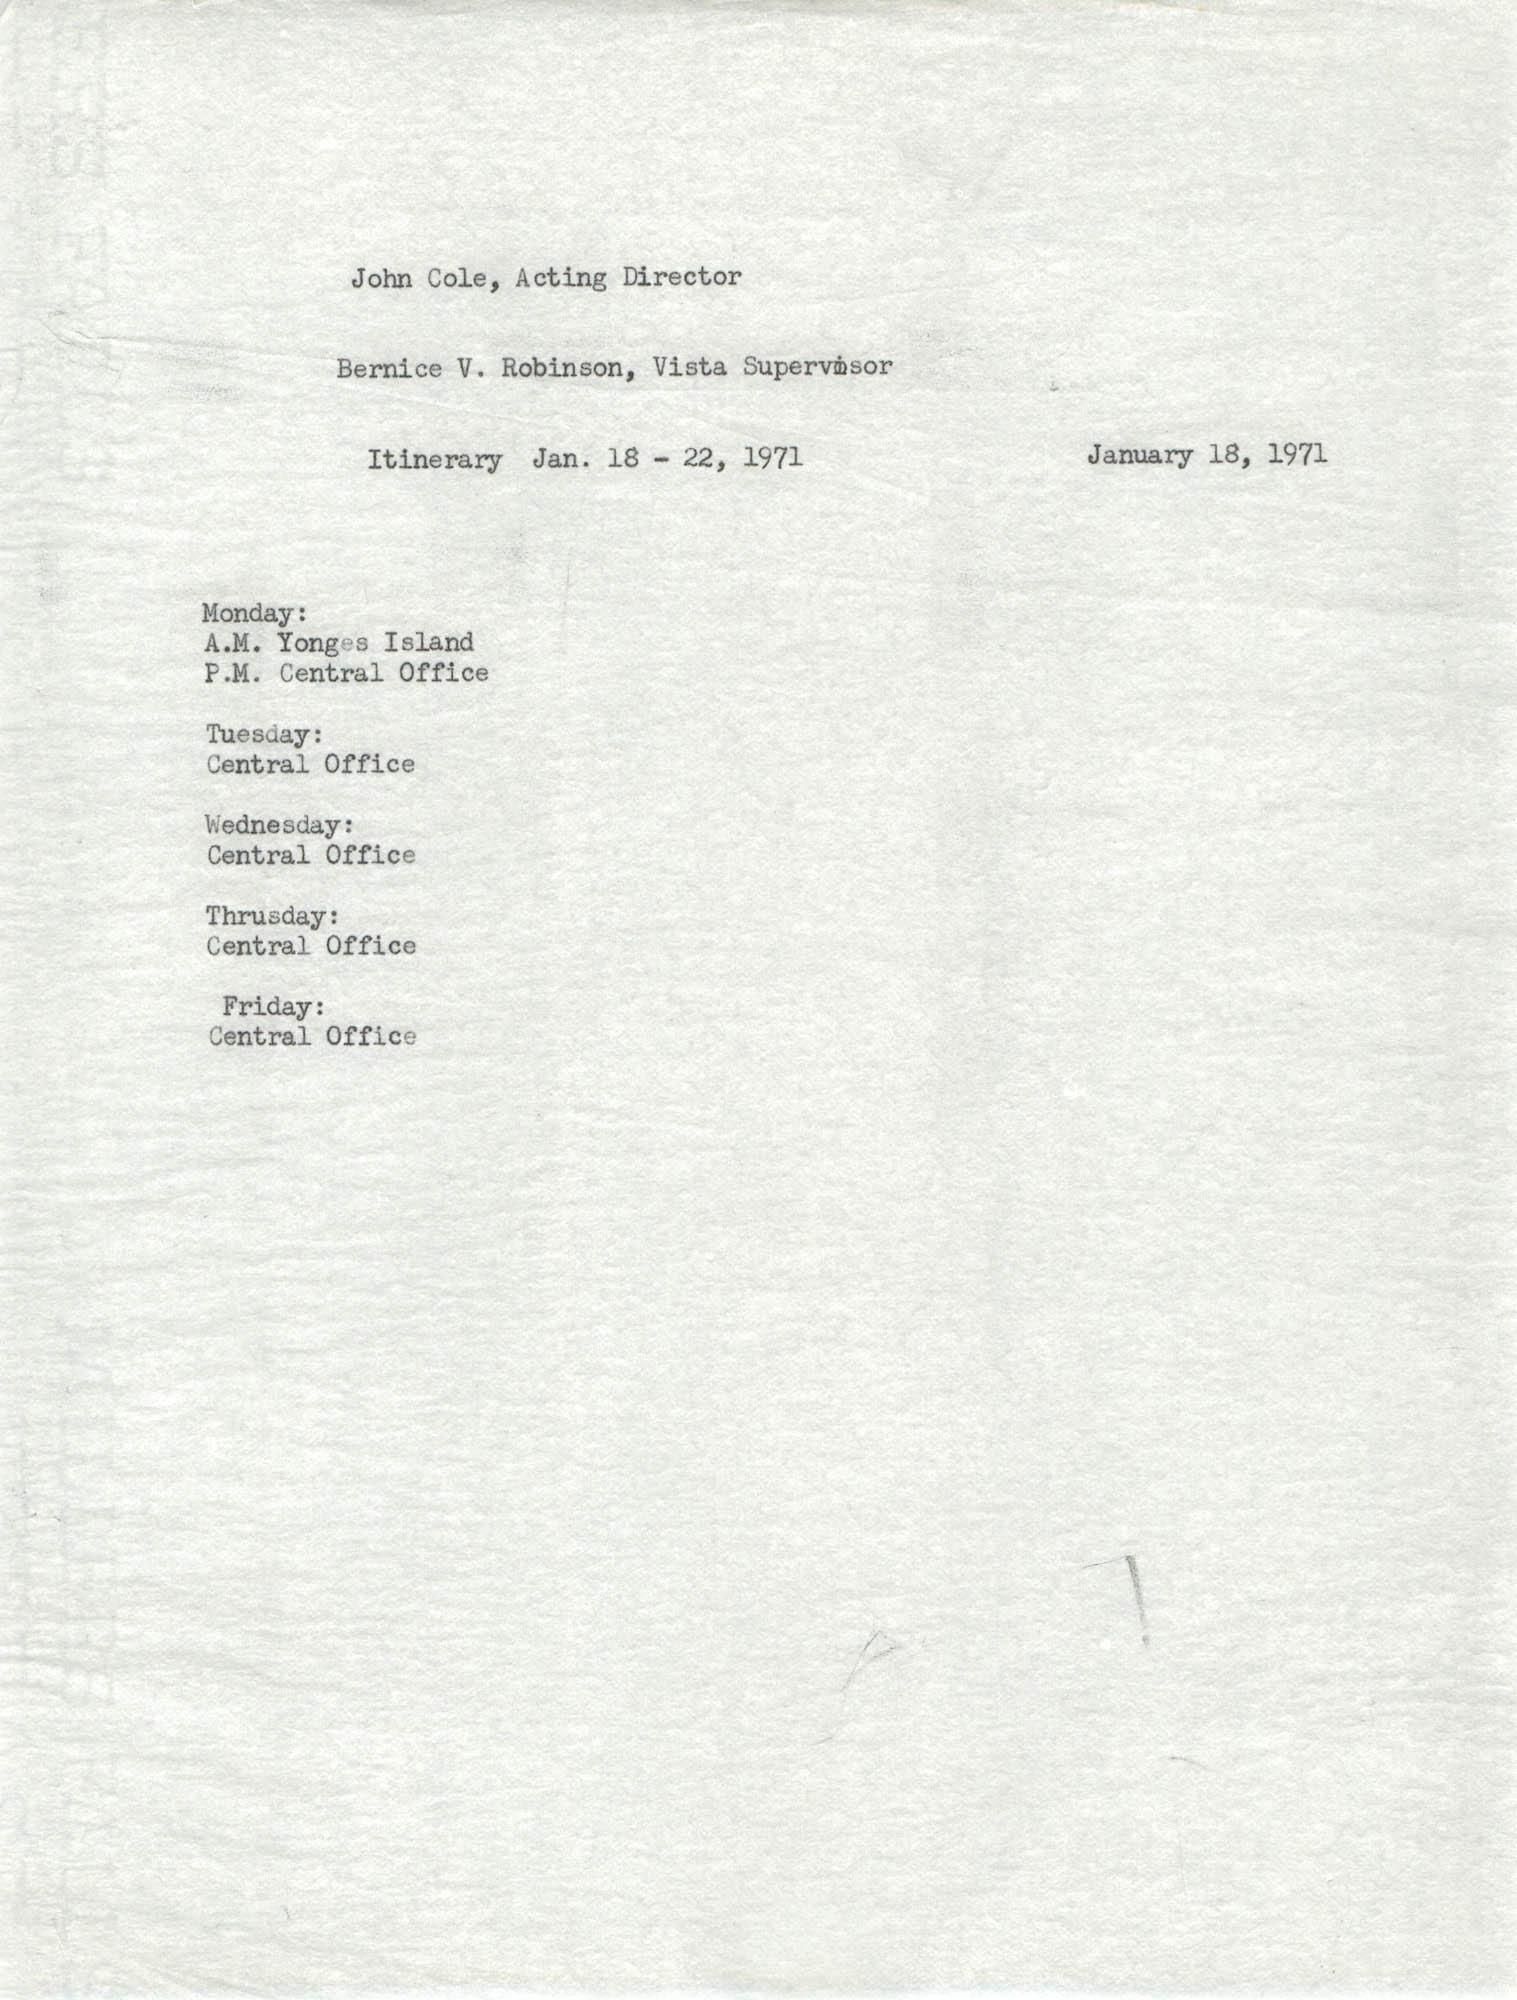 Memorandum from Bernice V. Robinson to John Cole, January 18, 1971